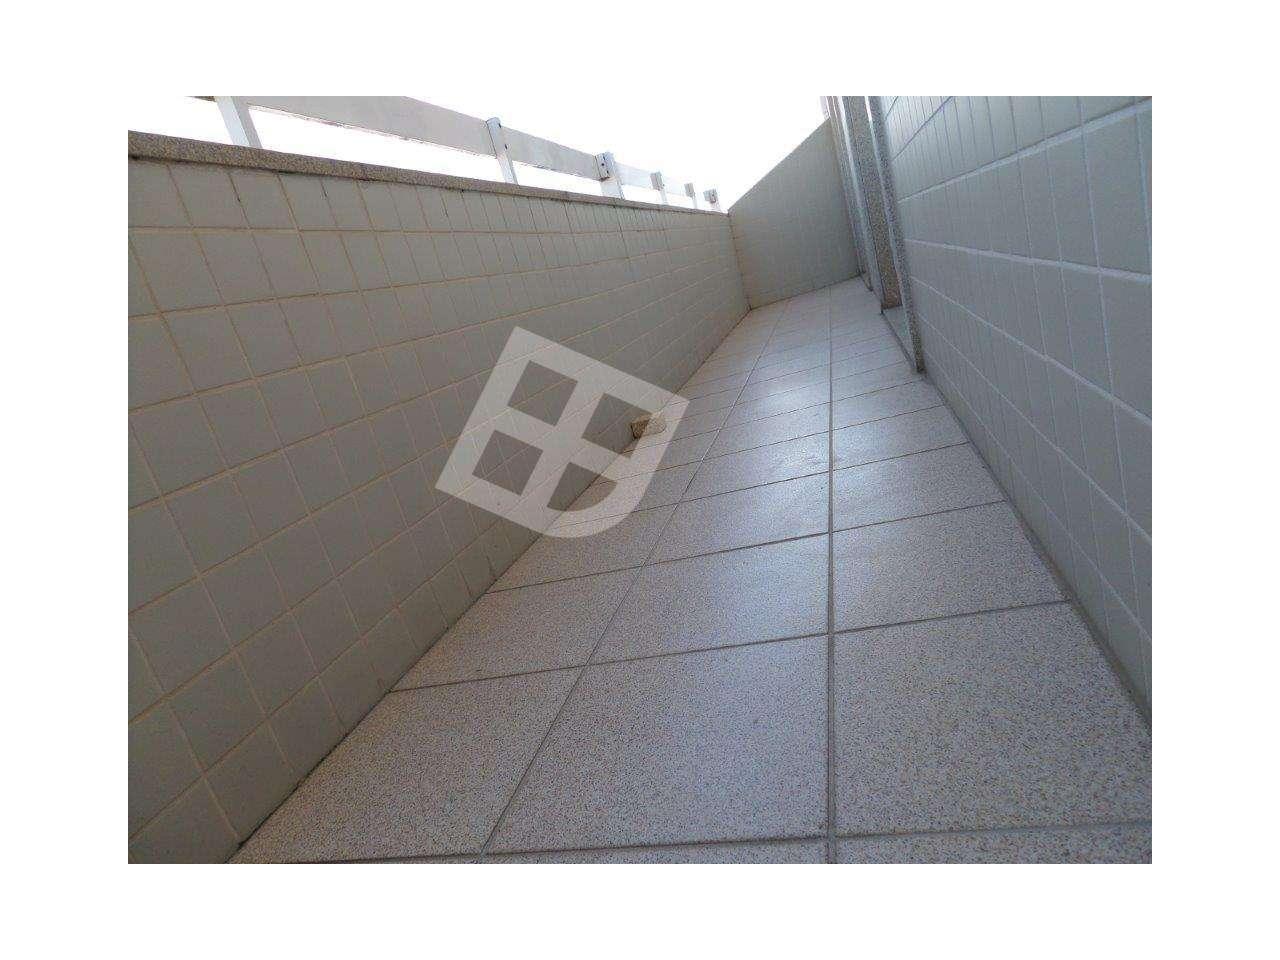 Apartamento para comprar, Gafanha da Nazaré, Aveiro - Foto 10